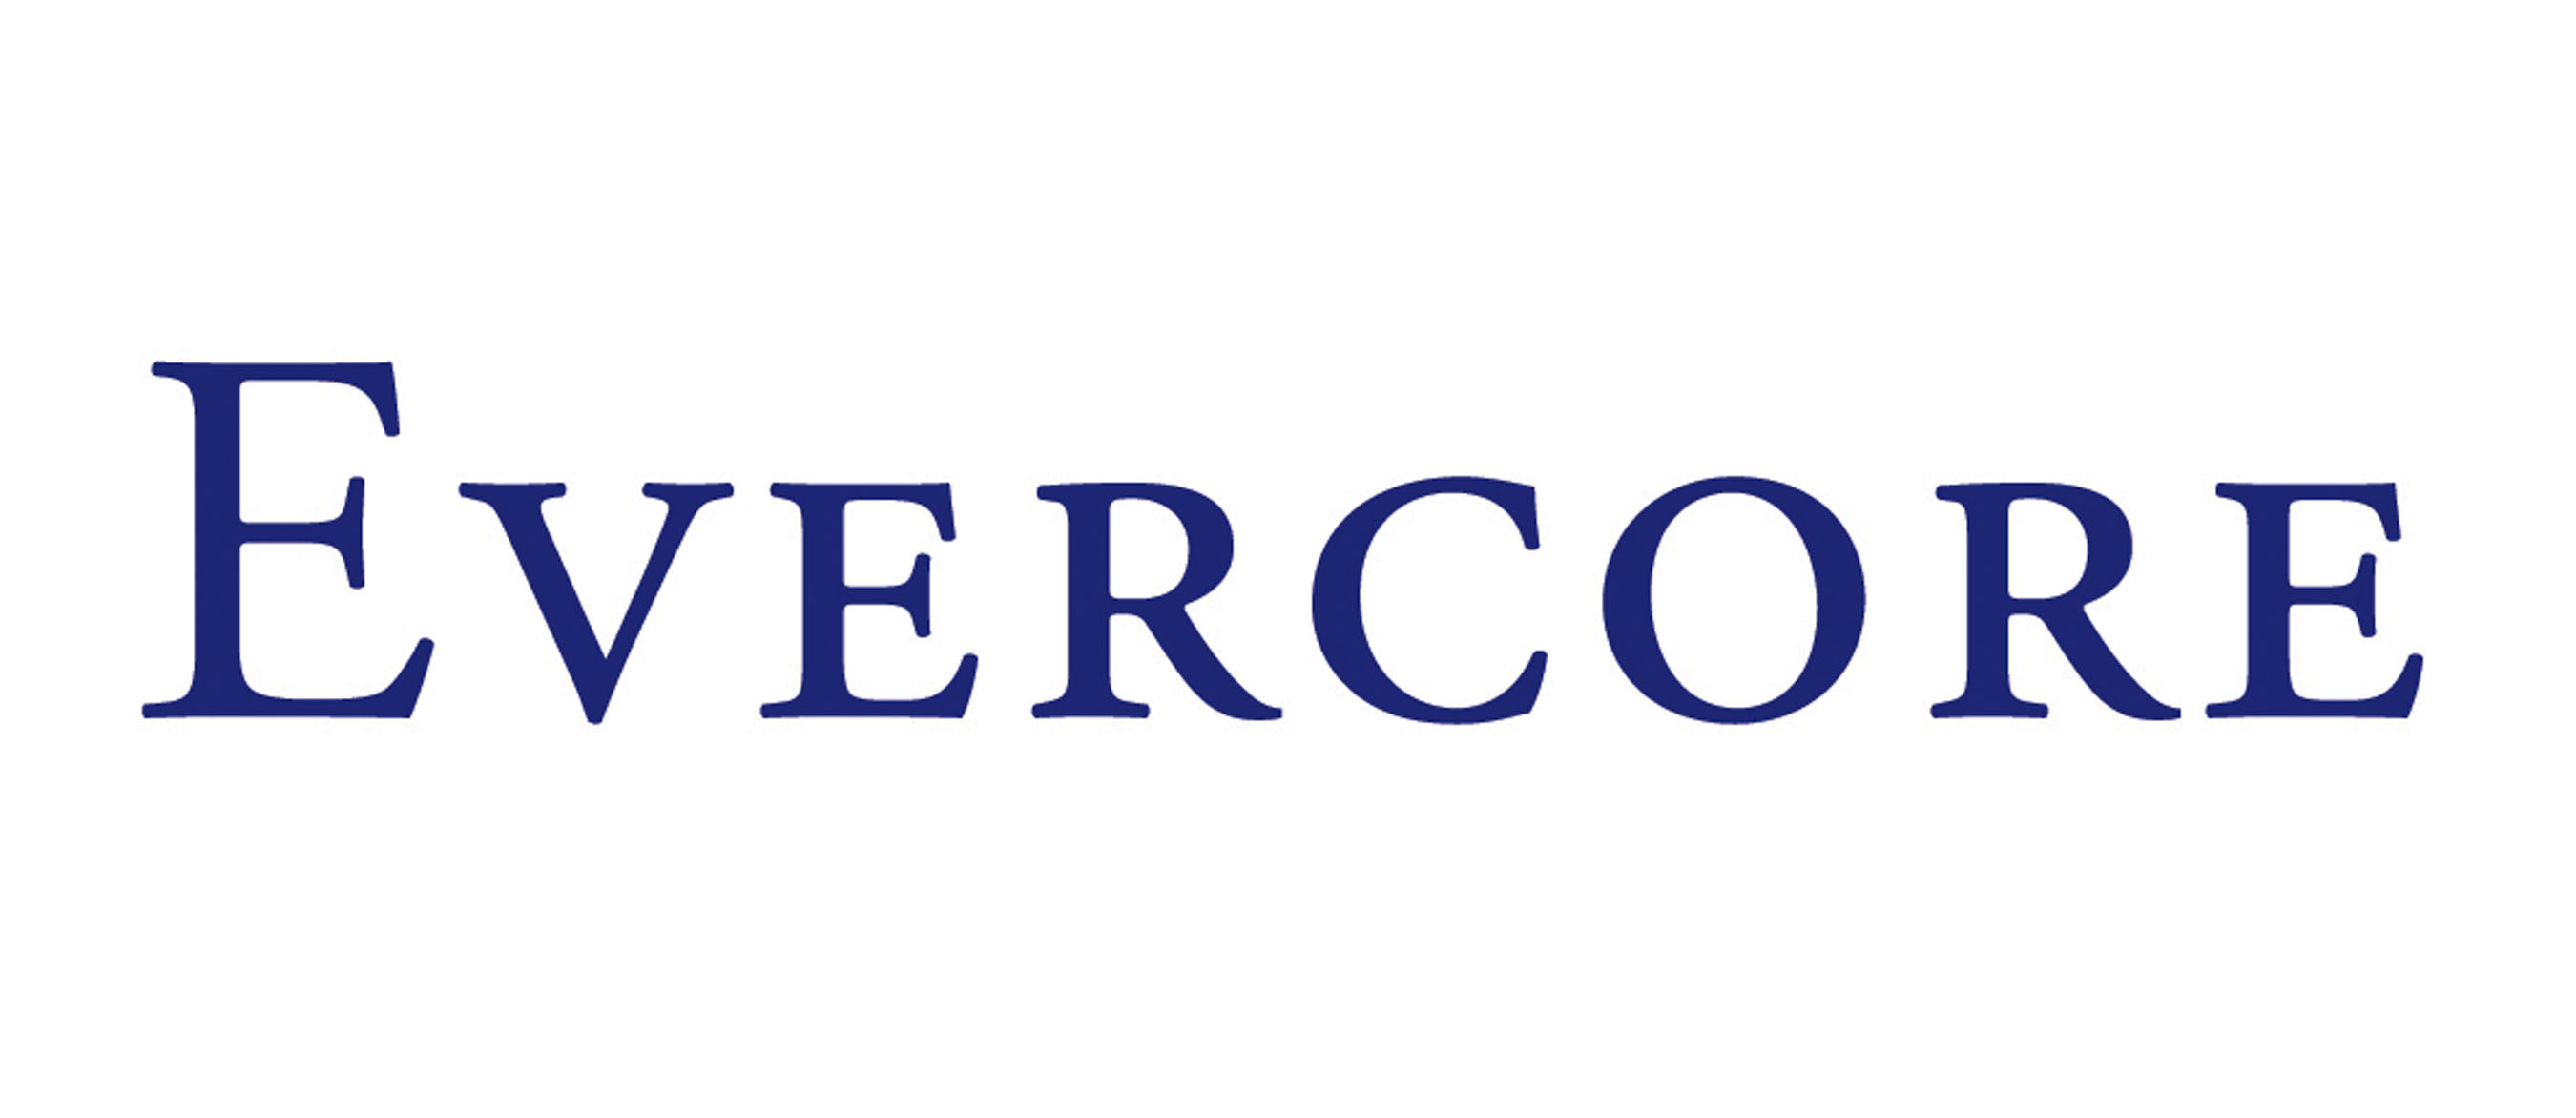 Evercore (PRNewsFoto/Evercore Wealth Management LLC) (PRNewsFoto/Evercore)